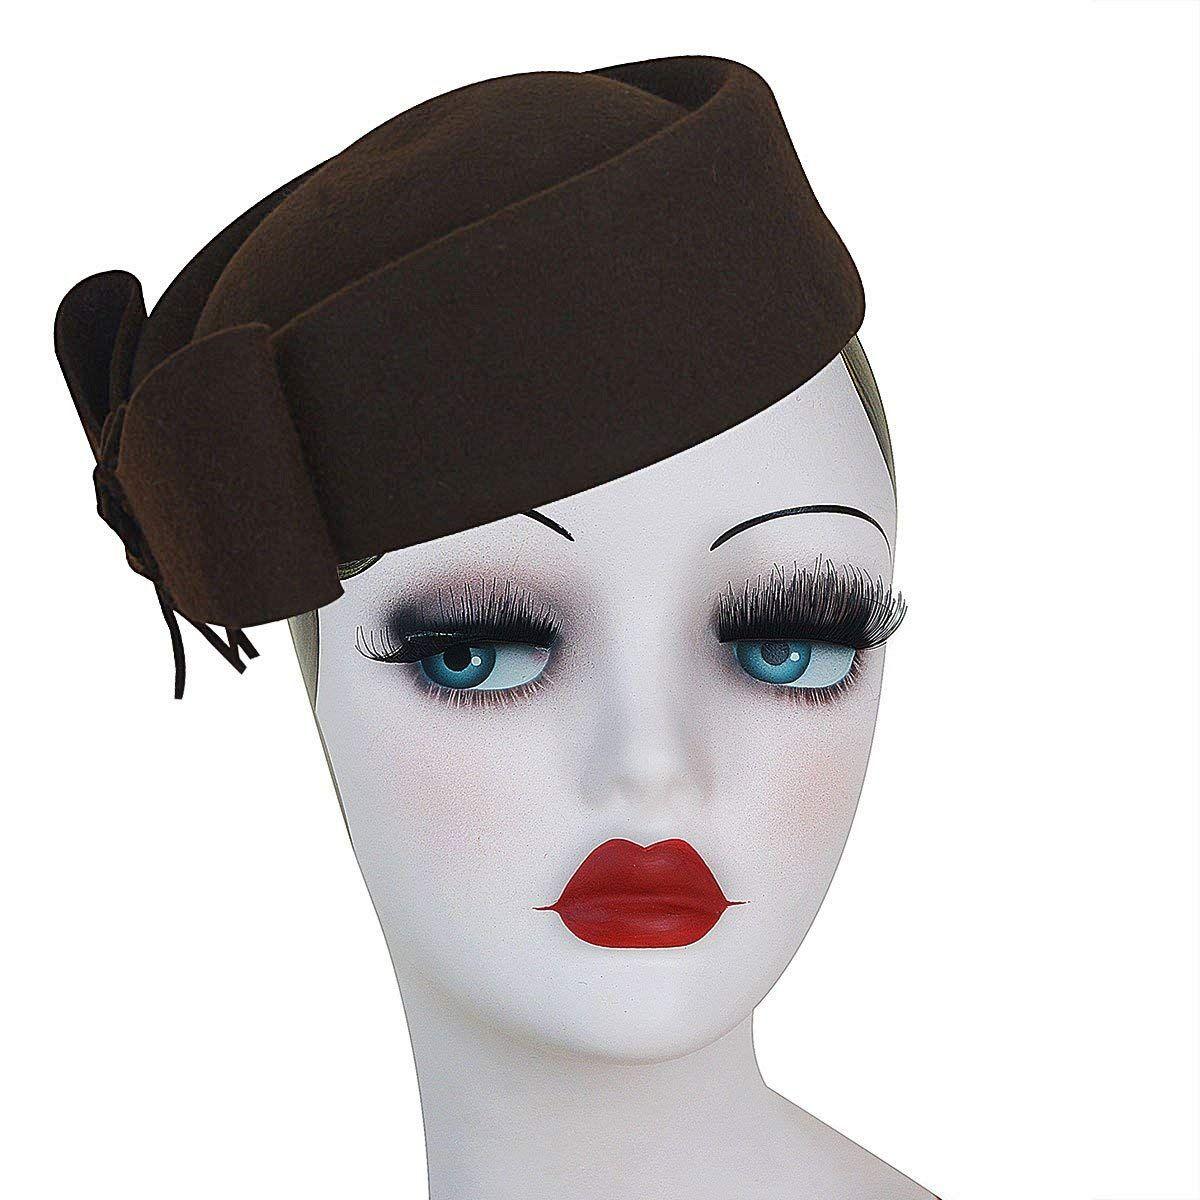 1940s Hats History 20 Popular Women S Hat Styles Retro Hats 1940s Hats Hat Fashion [ 1200 x 1200 Pixel ]